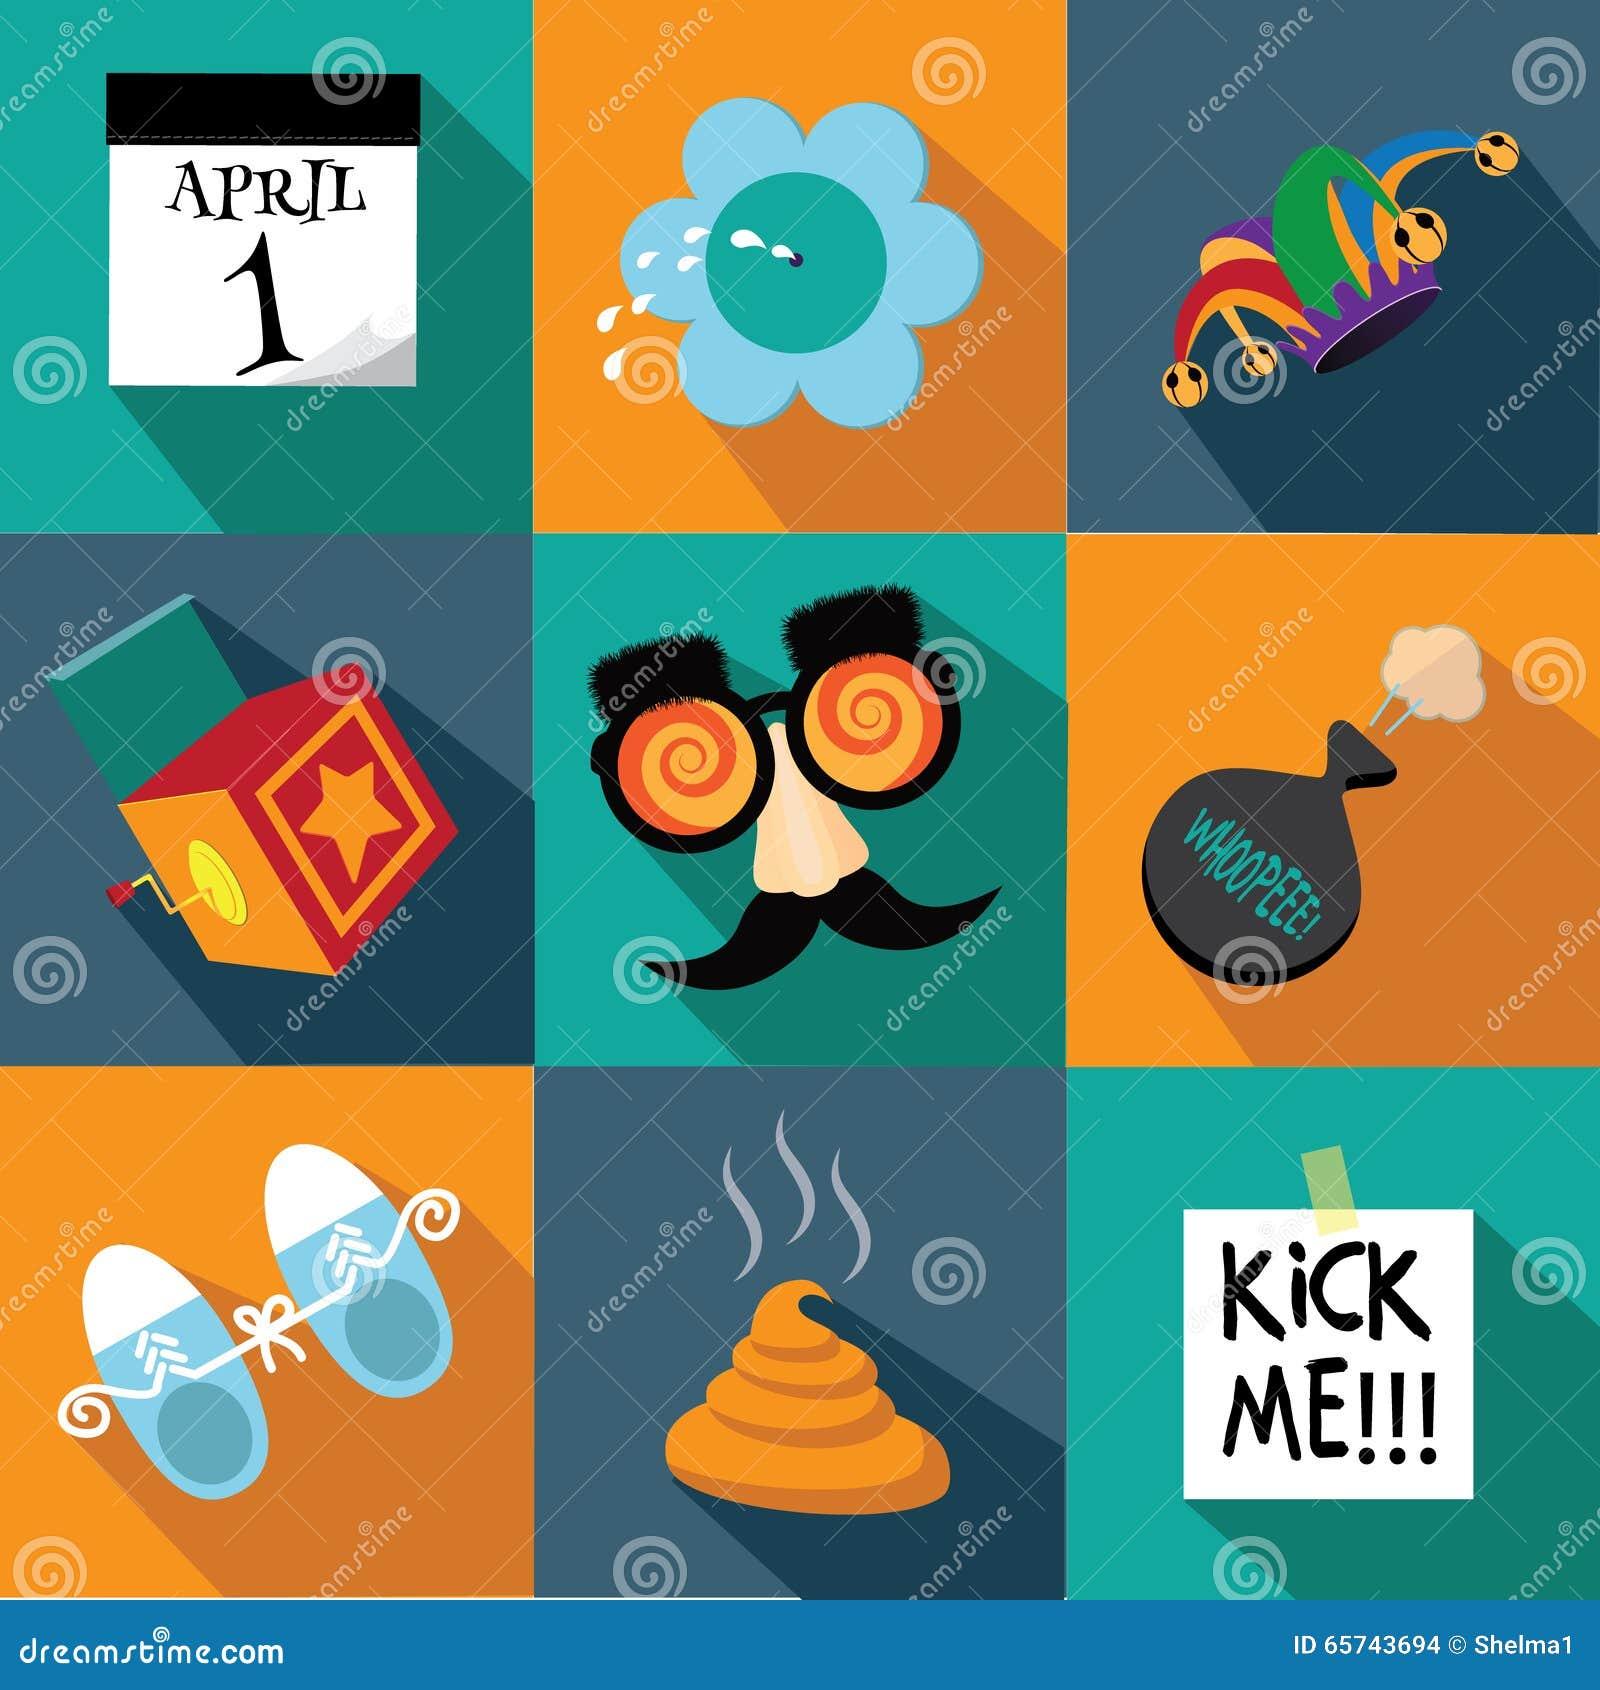 April Fools Day flat design icon set